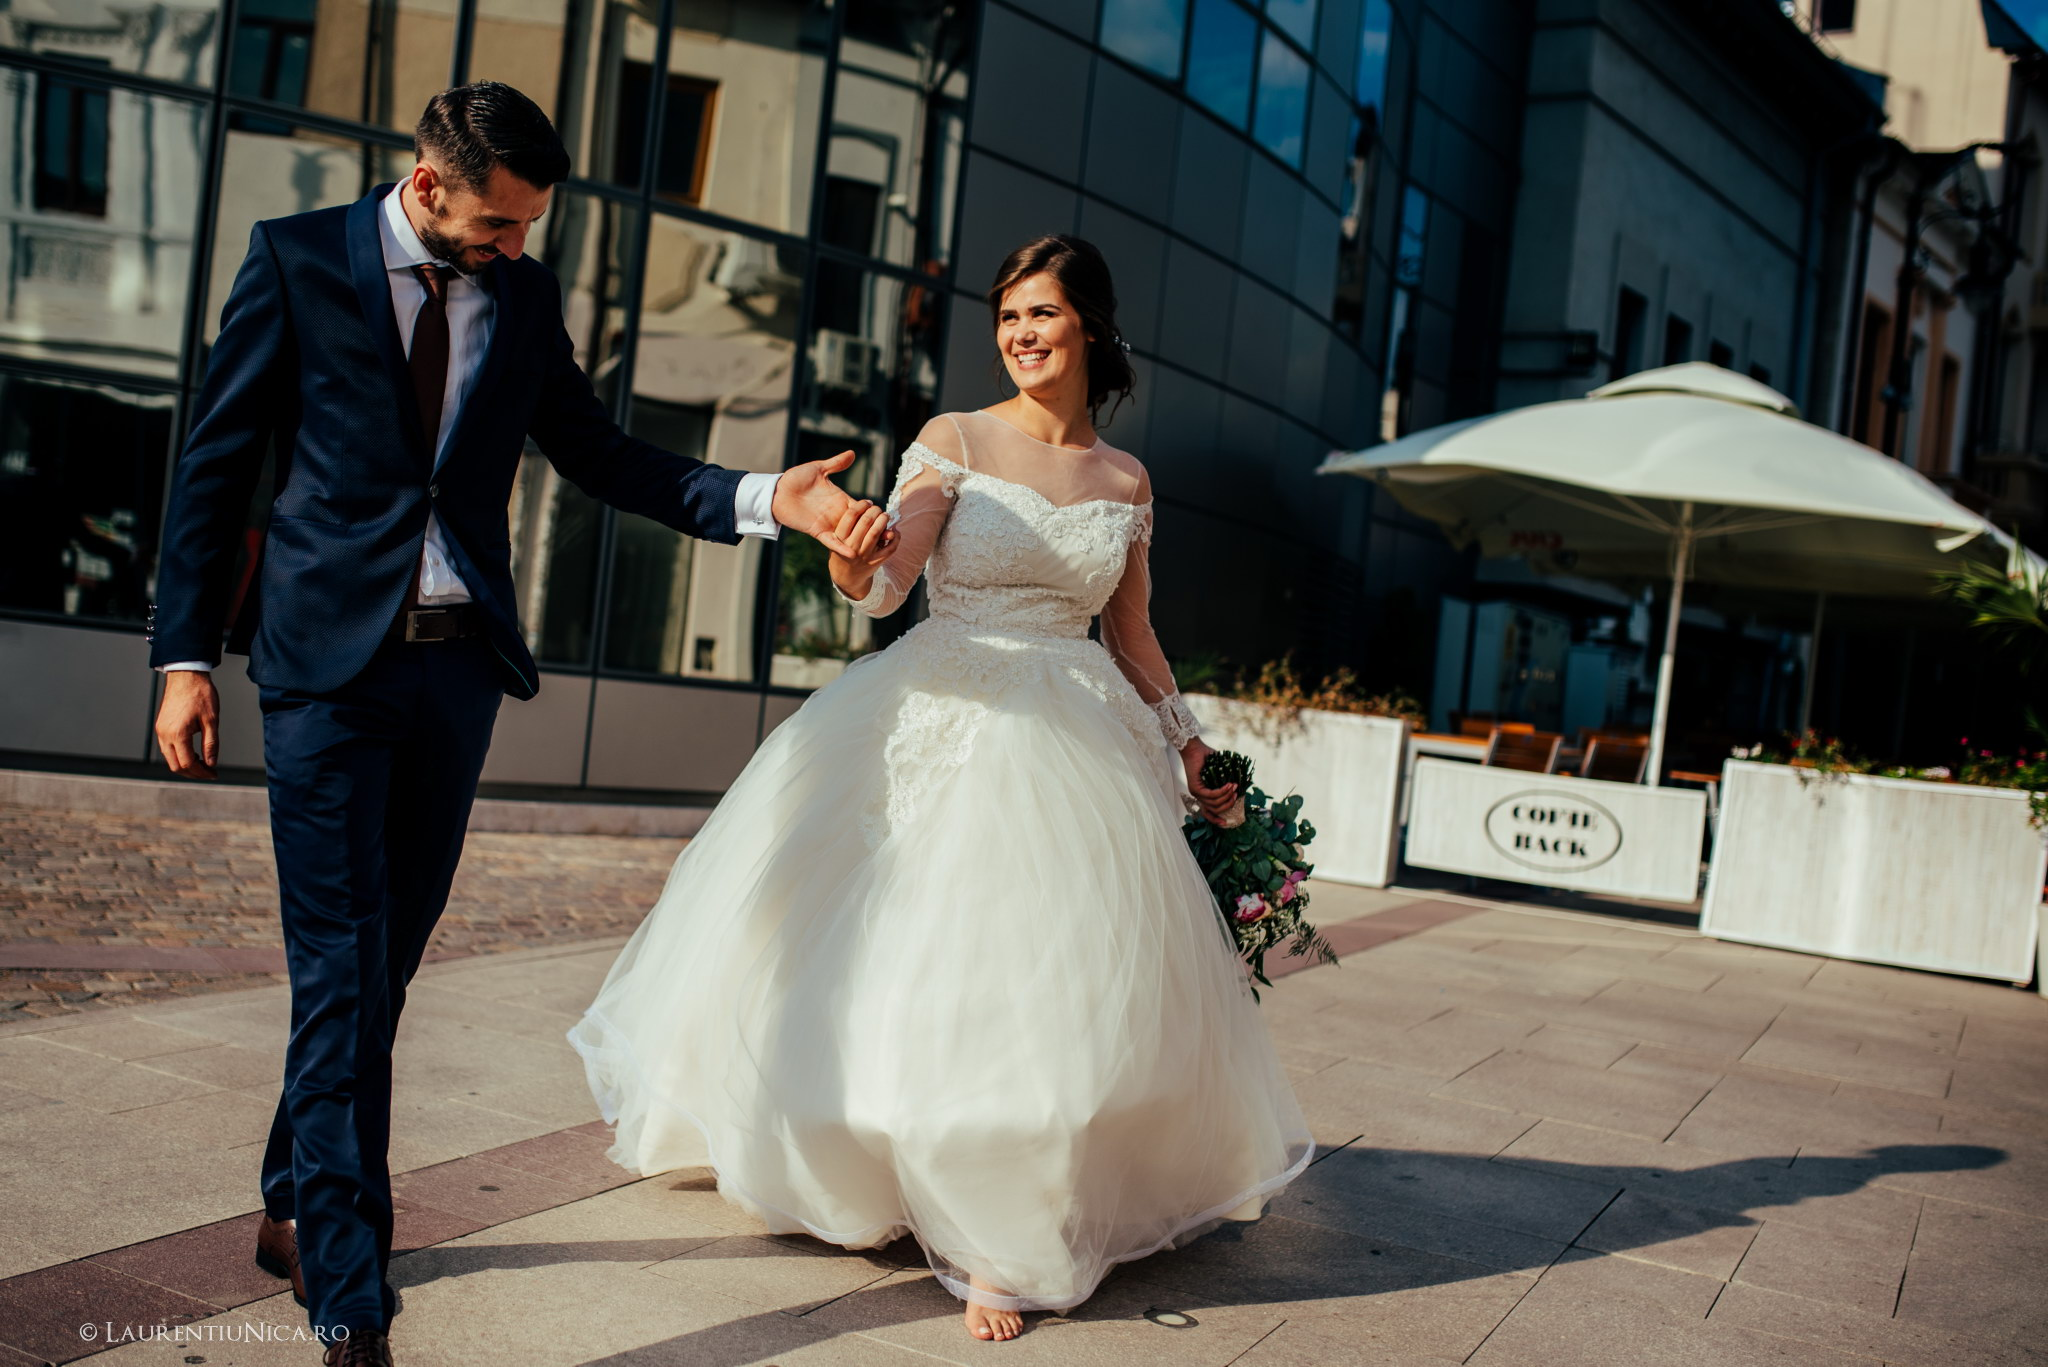 Alina si Andrei fotograf nunta laurentiu nica craiova 37 - Alina & Andrei | Fotografii nunta